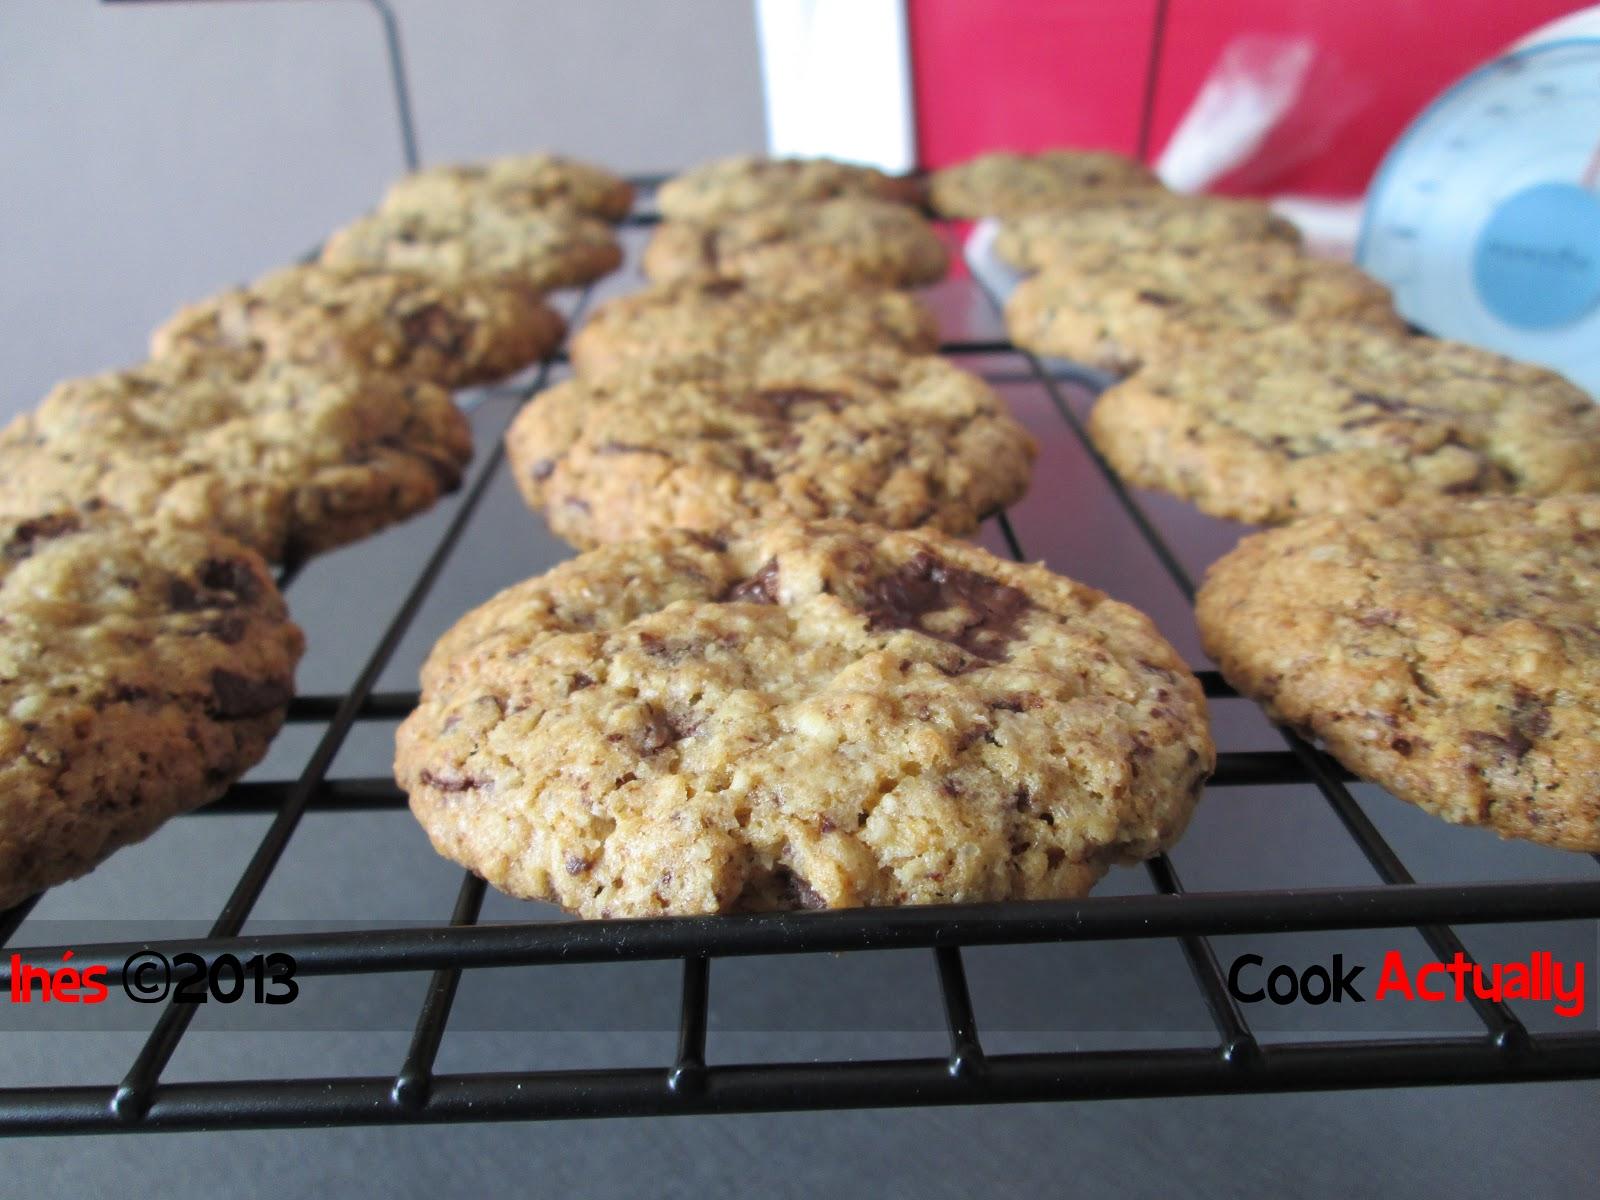 Cook actually galletas de avena chocolate y polvos de flan for Azucar gelificante